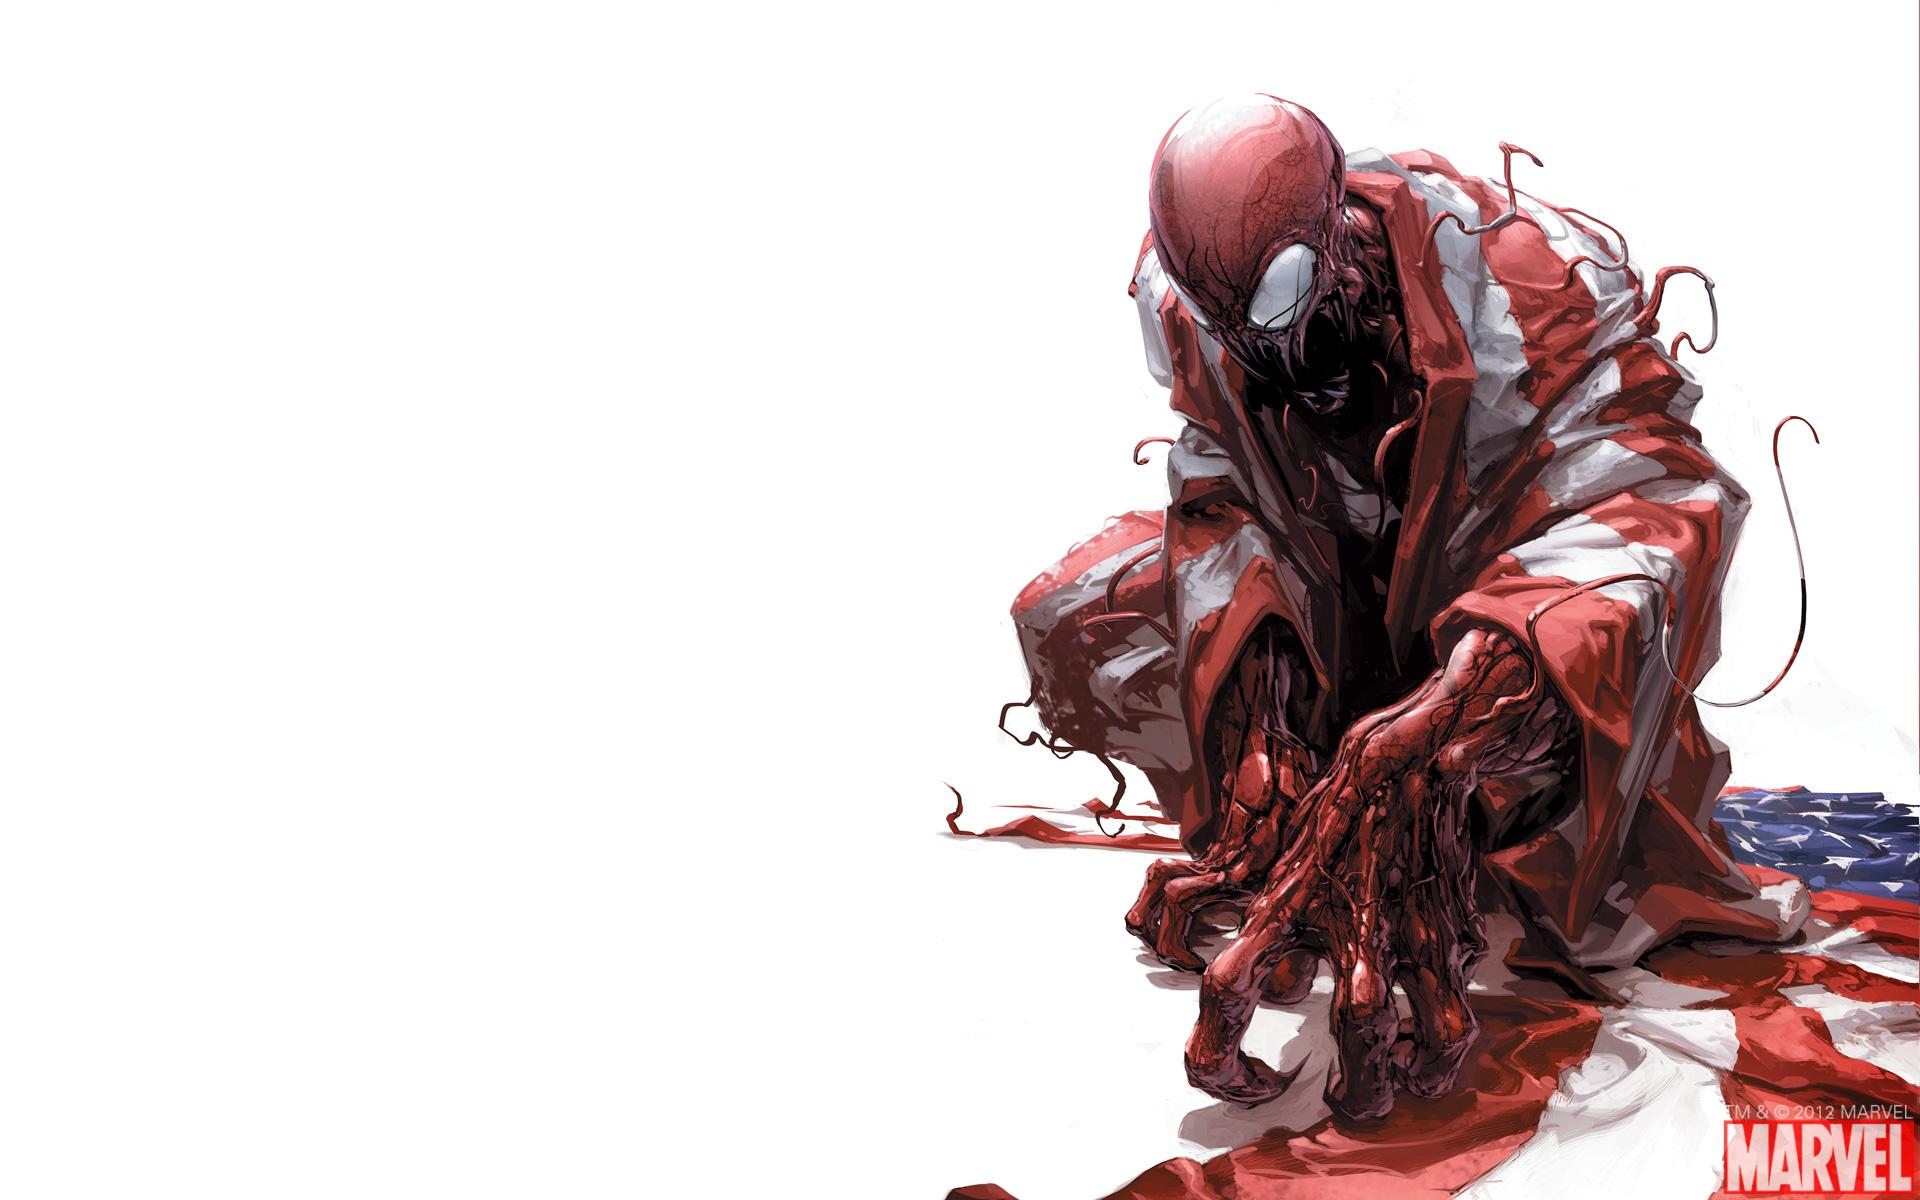 <b>Marvel Wallpaper</b> - <b>Wallpapers</b> Browse